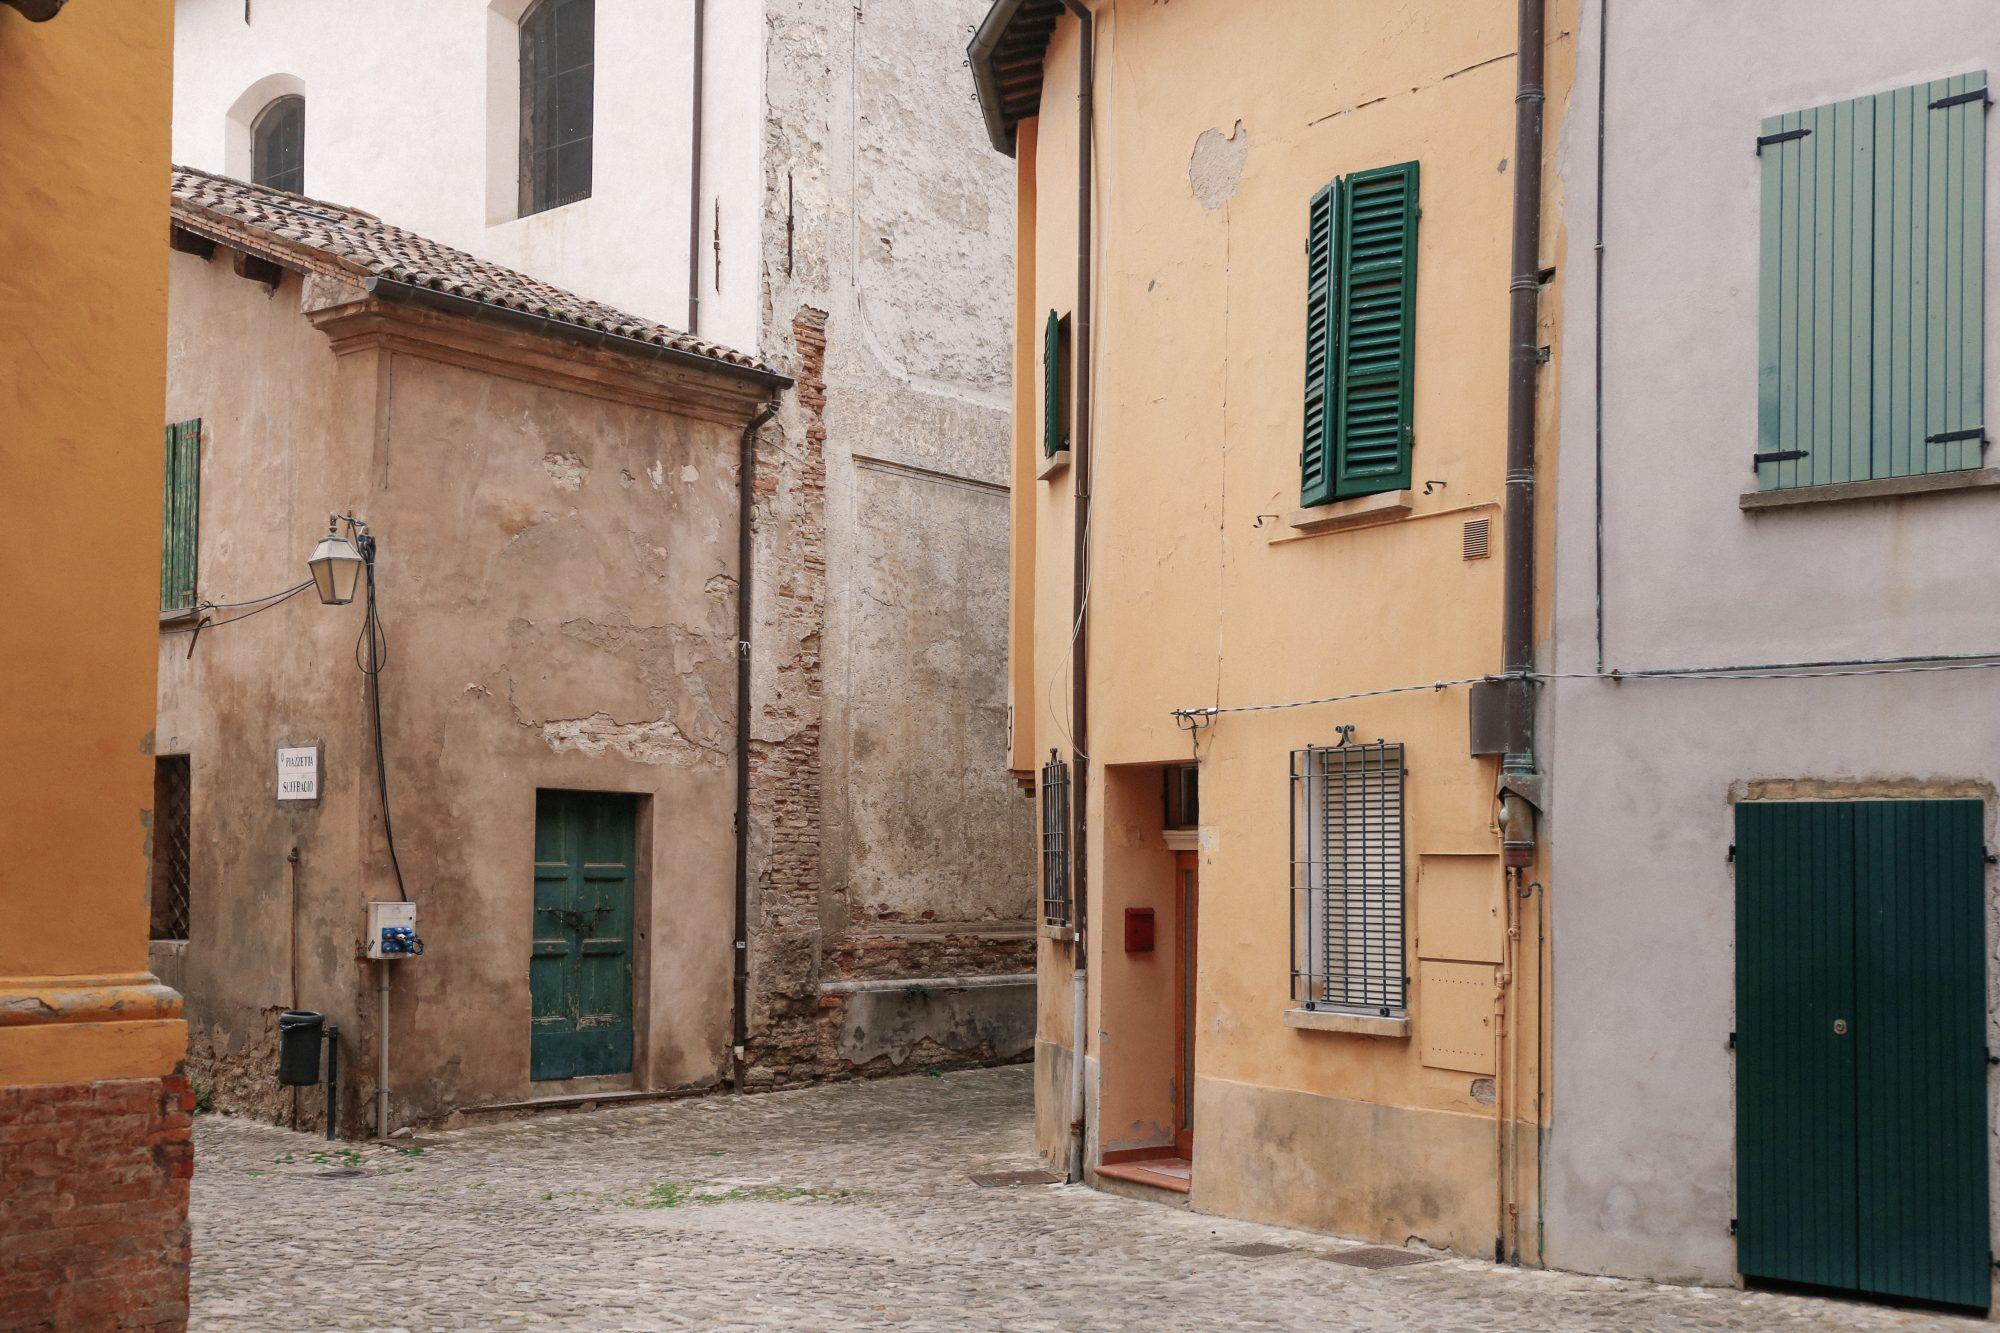 LandOutriders - Un weekend in Romagna con Pier Giulio Caivano | Collater.al 3